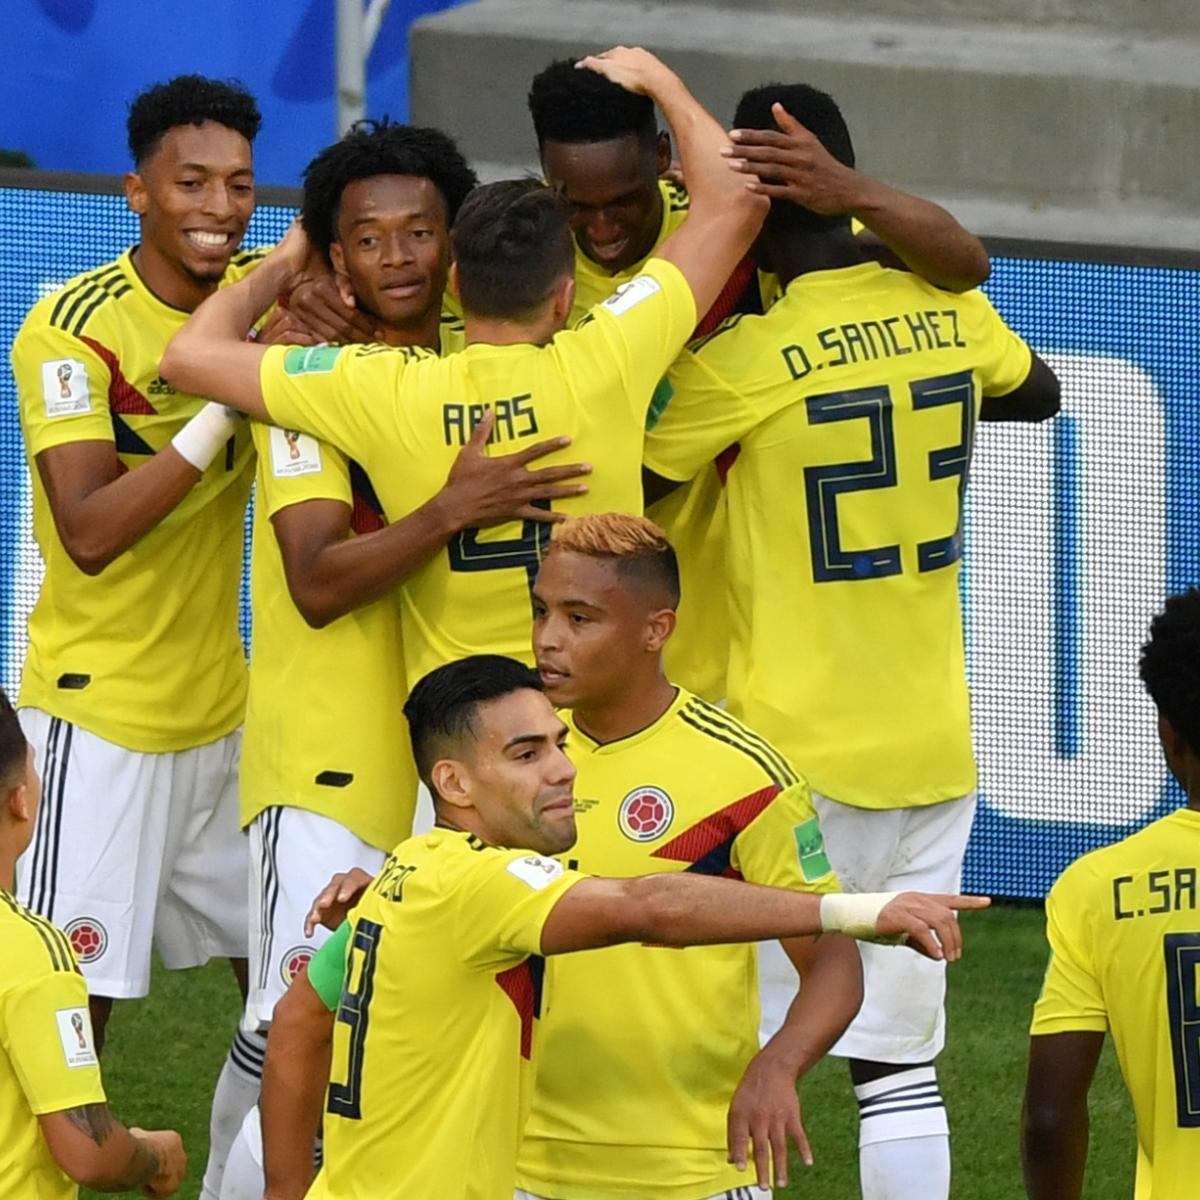 England Vs Kolumbien